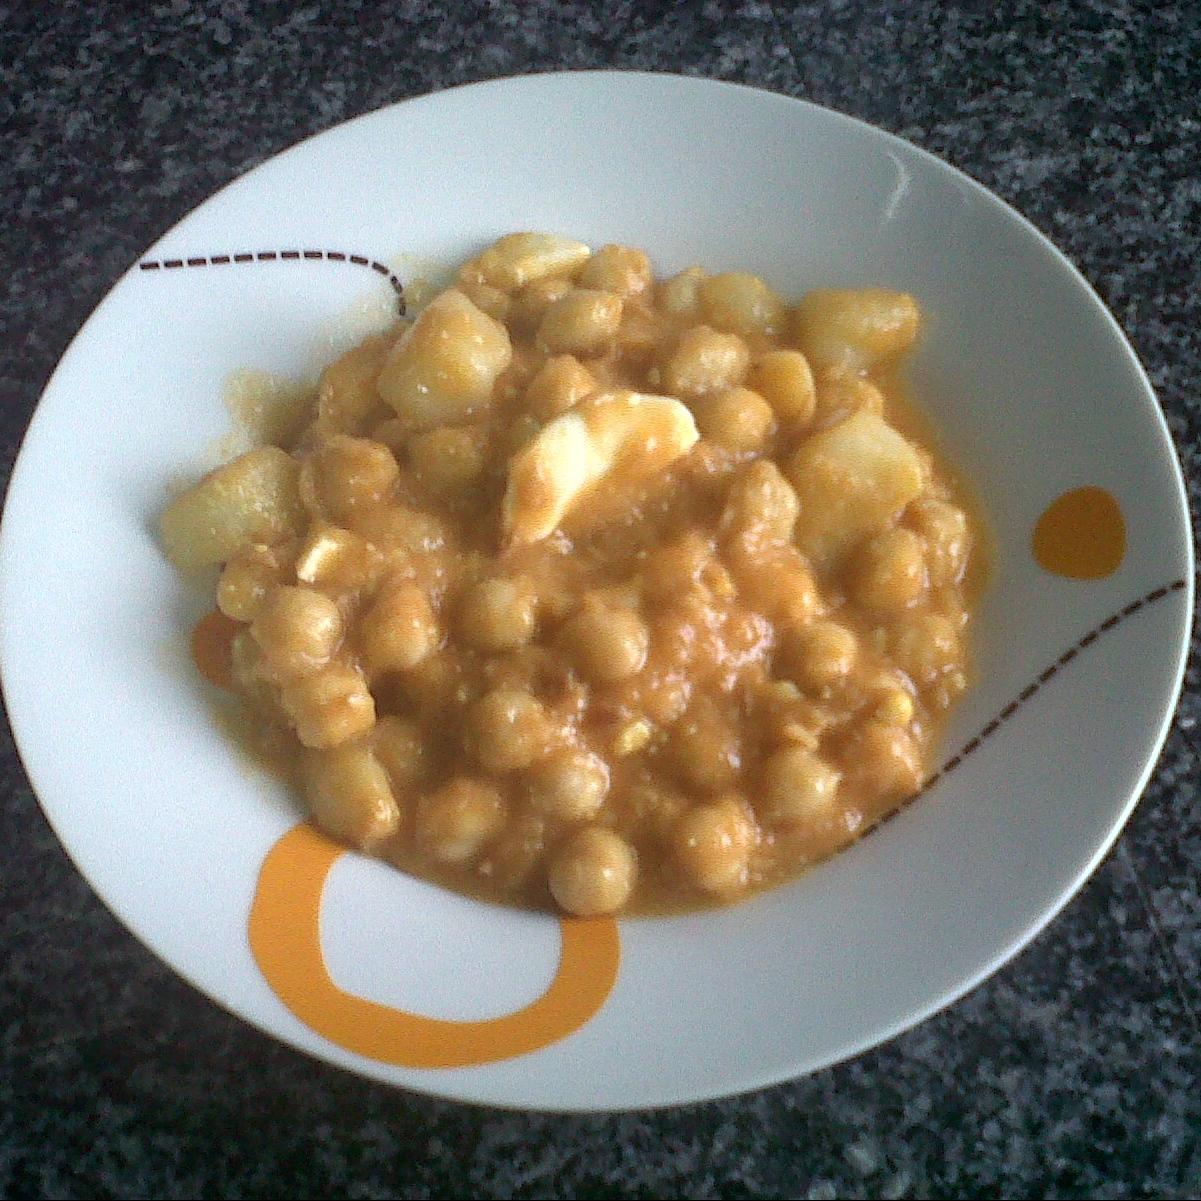 Garbanzos con at n y huevo cocido 4 3 5 - Garbanzos olla express ...